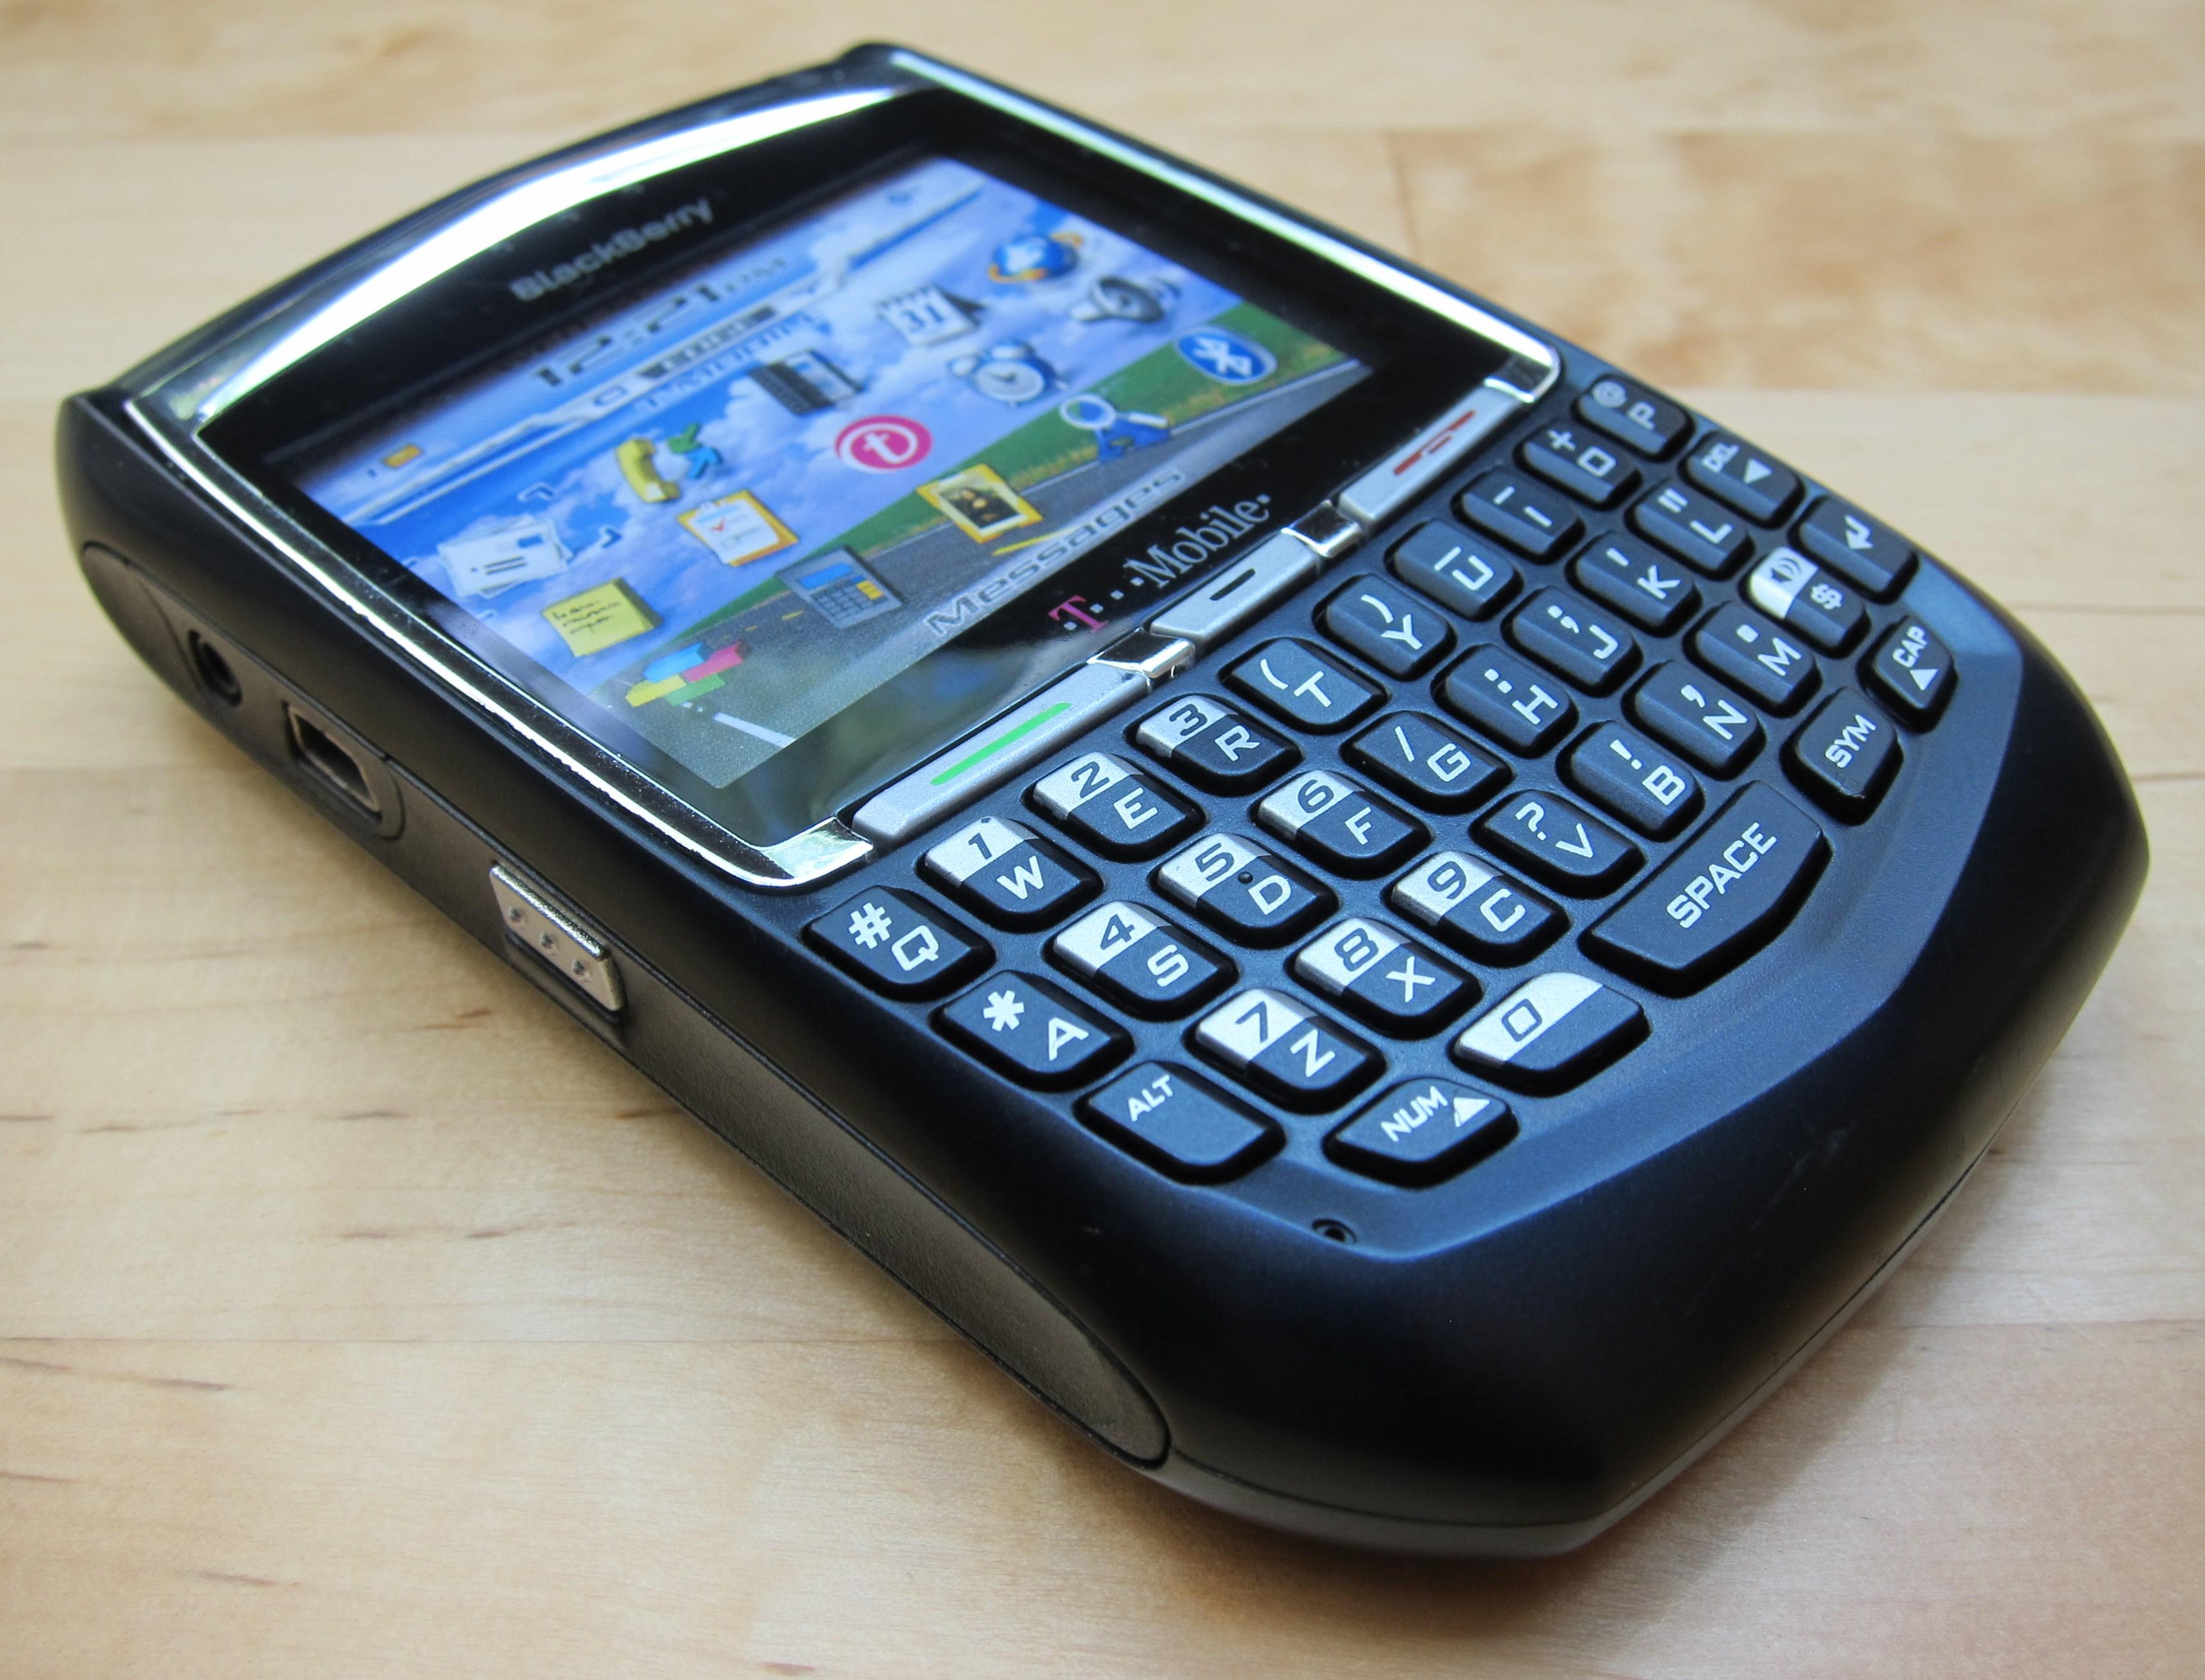 blackberry 8700 series manual watch arctic air season 2 online free rh anzbank cf BlackBerry 9810 BlackBerry 9810